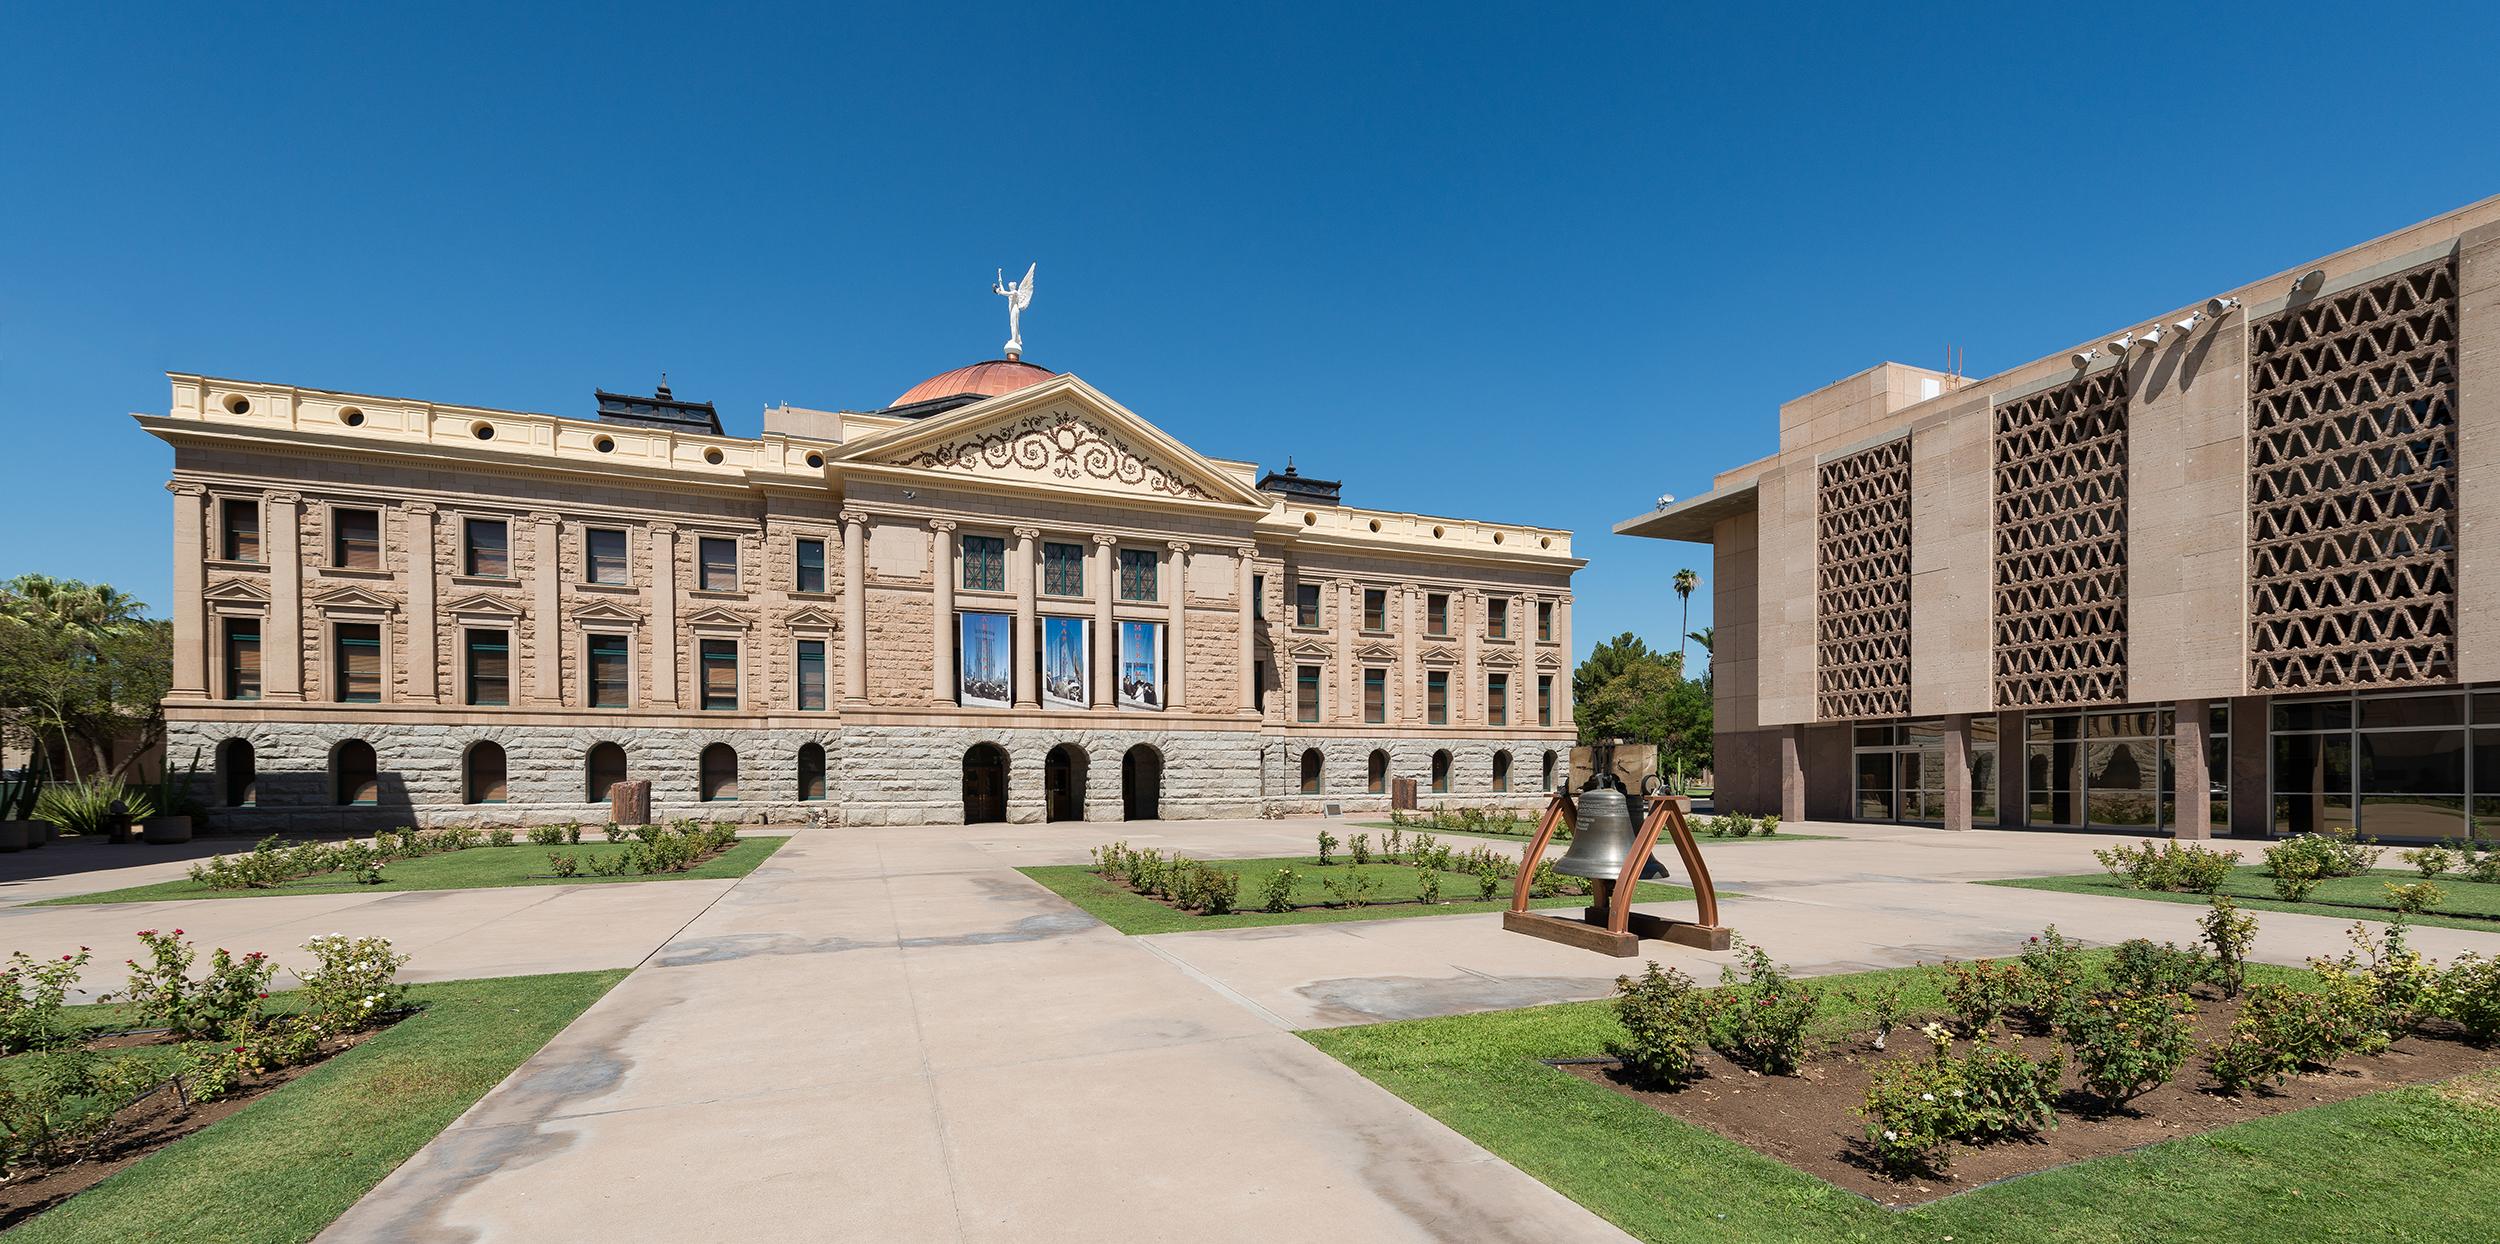 Arizona mail-in voting bill stalls in Senate amid heated debate between GOP lawmakers